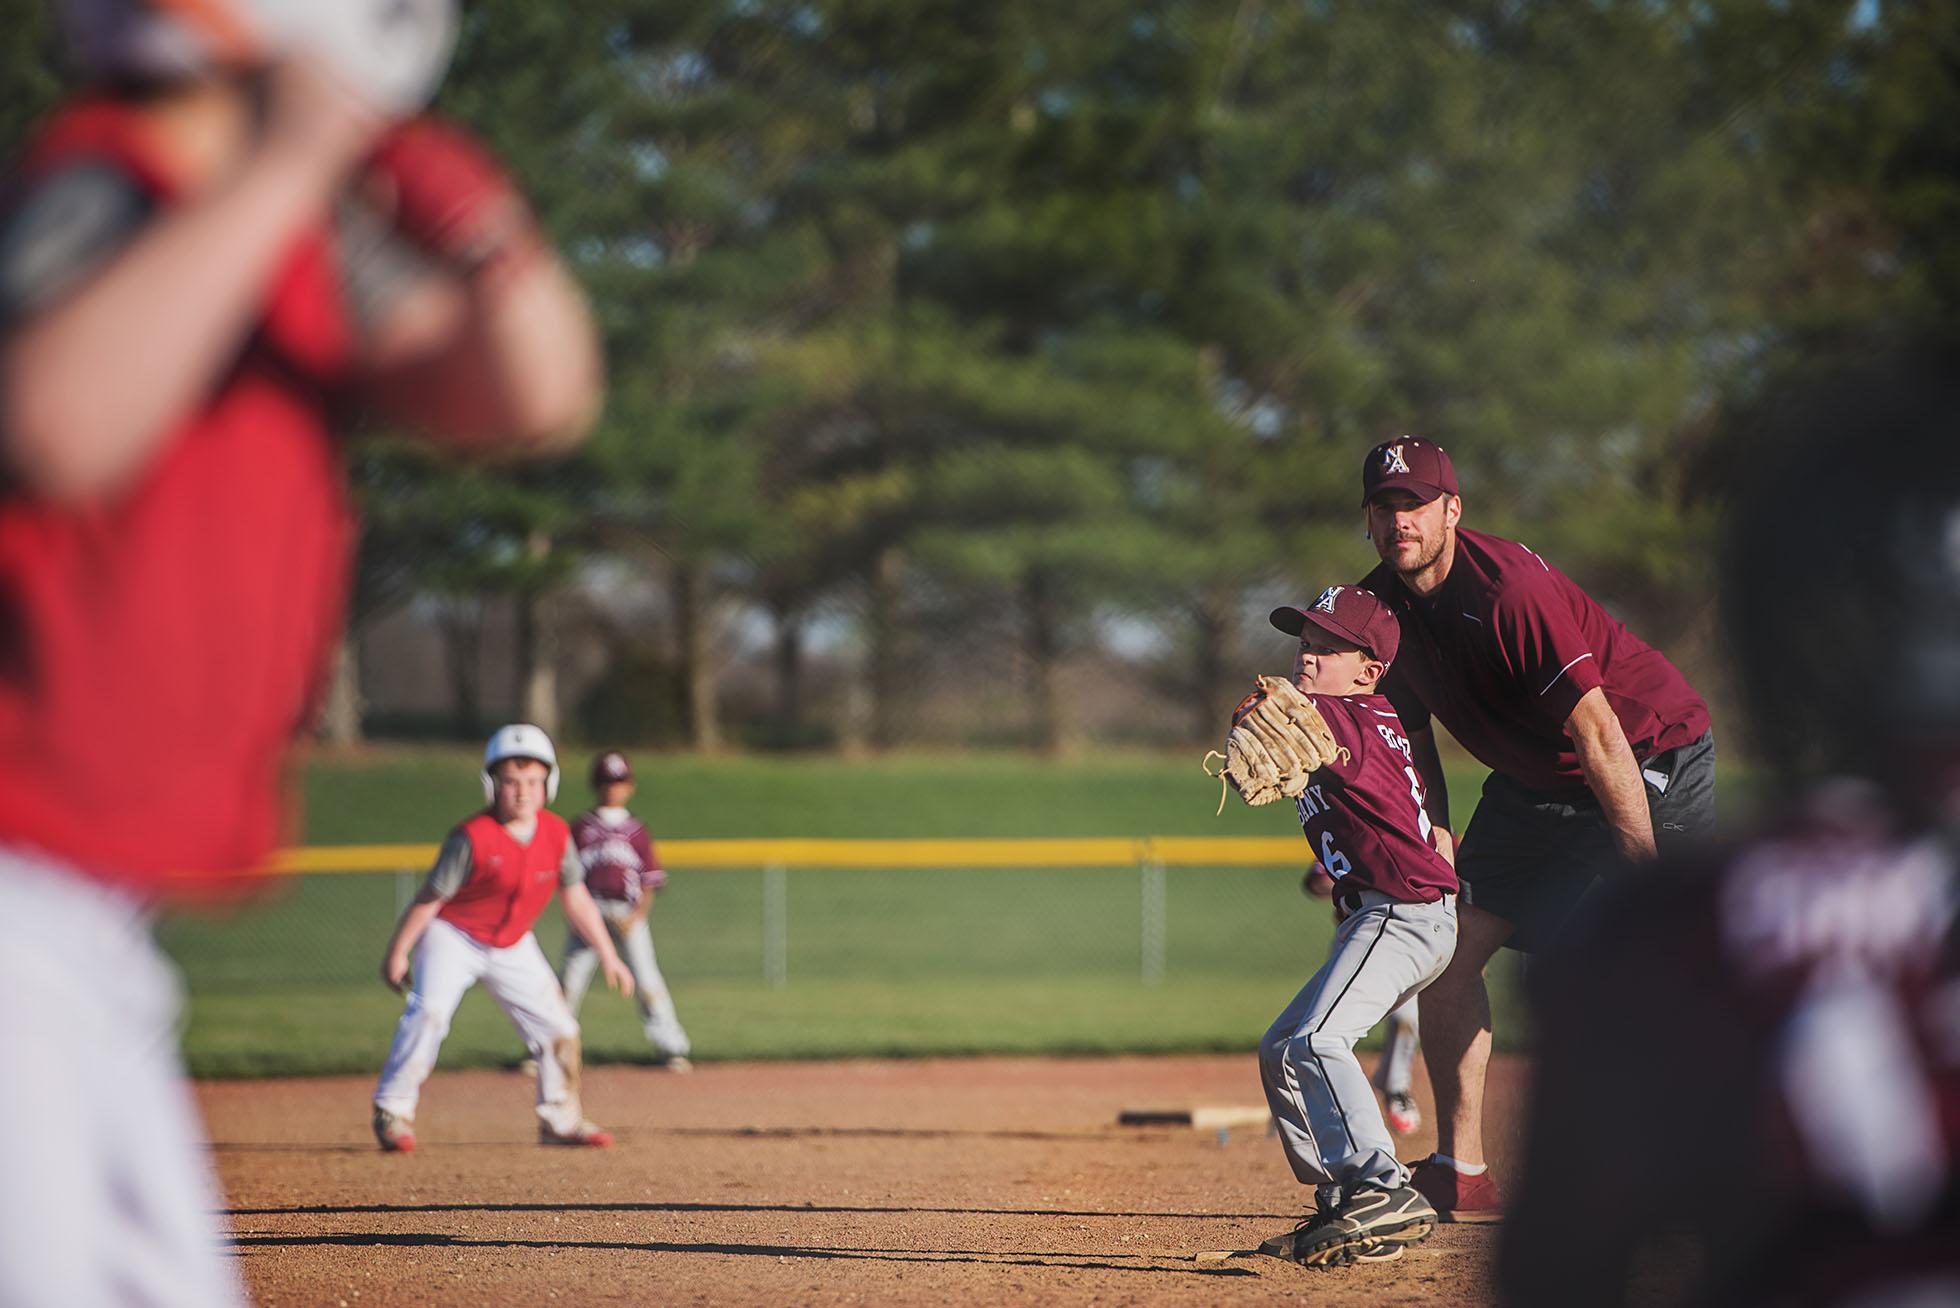 boy pitching baseball with coach behind him freezing motion kellie bieser